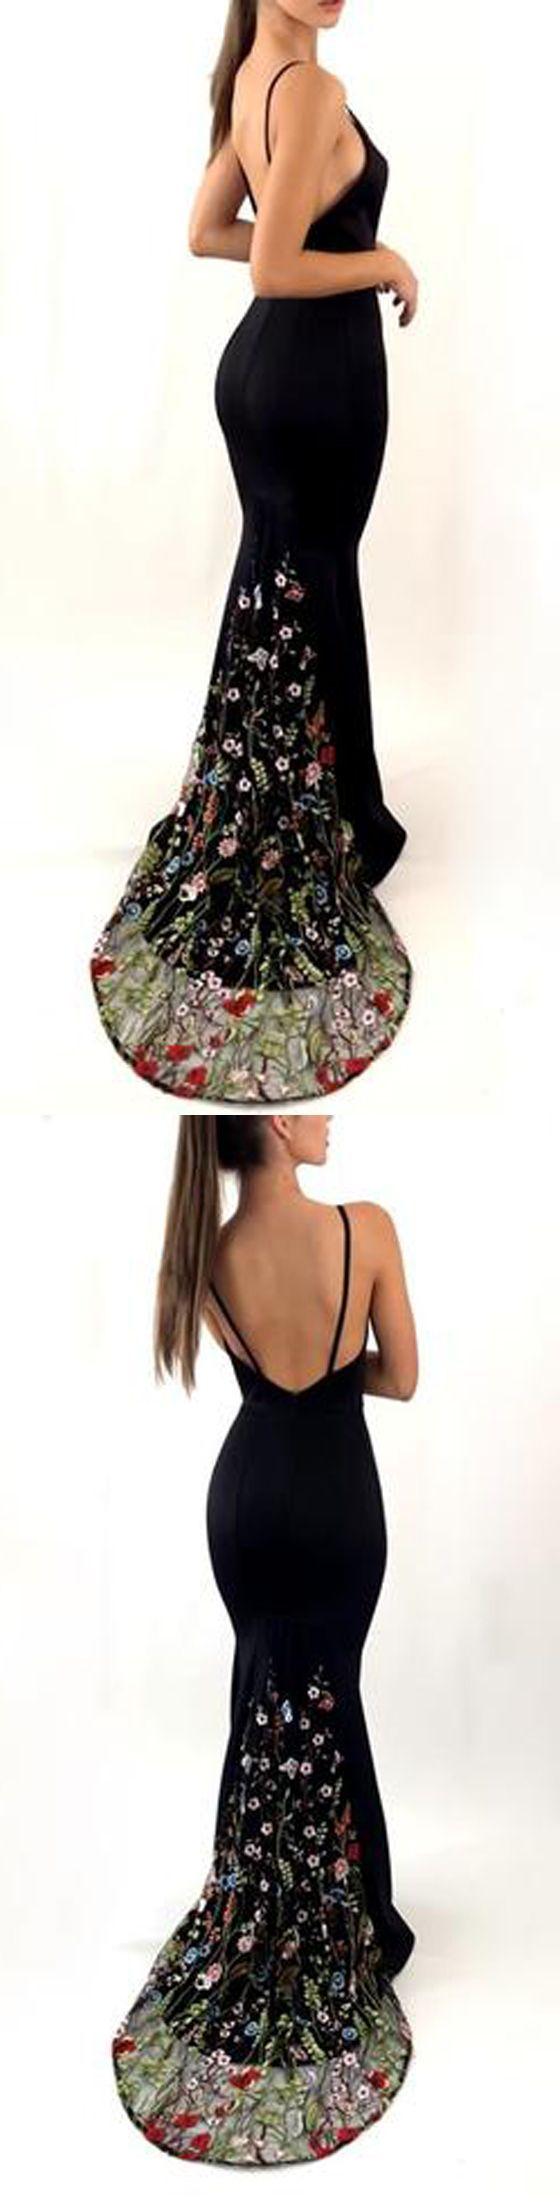 Charming Black New Mermaid Prom Dress, Flower Lace Appliques Unique Design Fashion Elegant Prom Dresses, PD0311